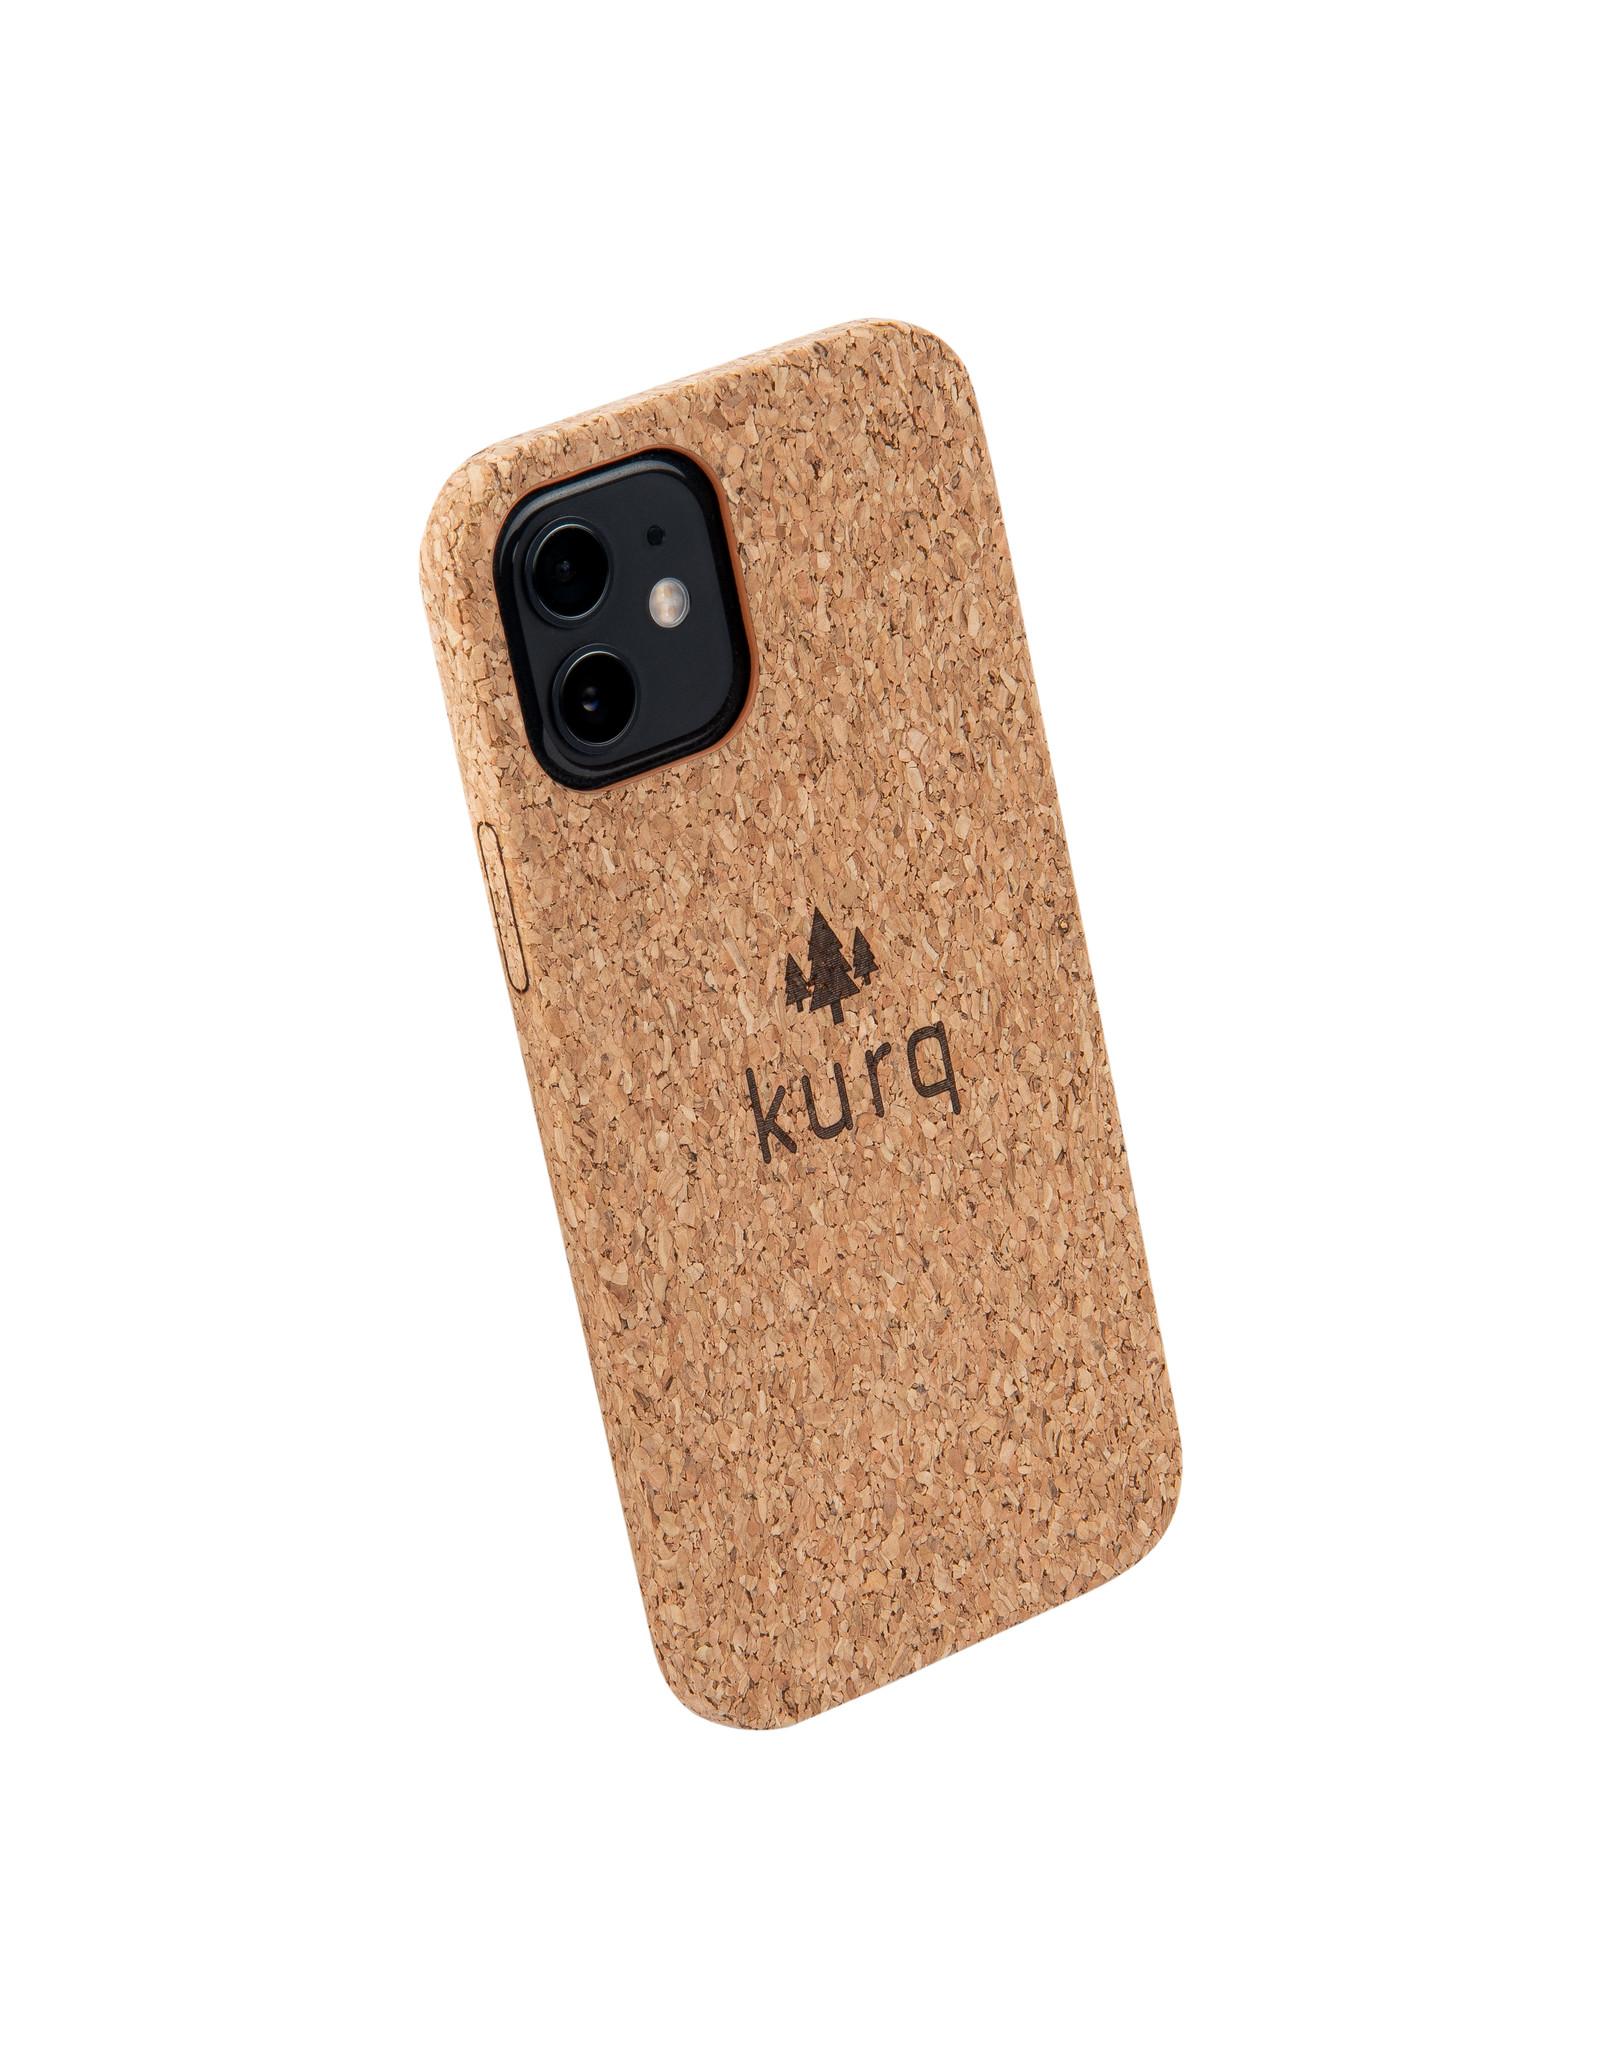 Cork phone case iPhone 12 Pro Max Cork phone case - KURQ